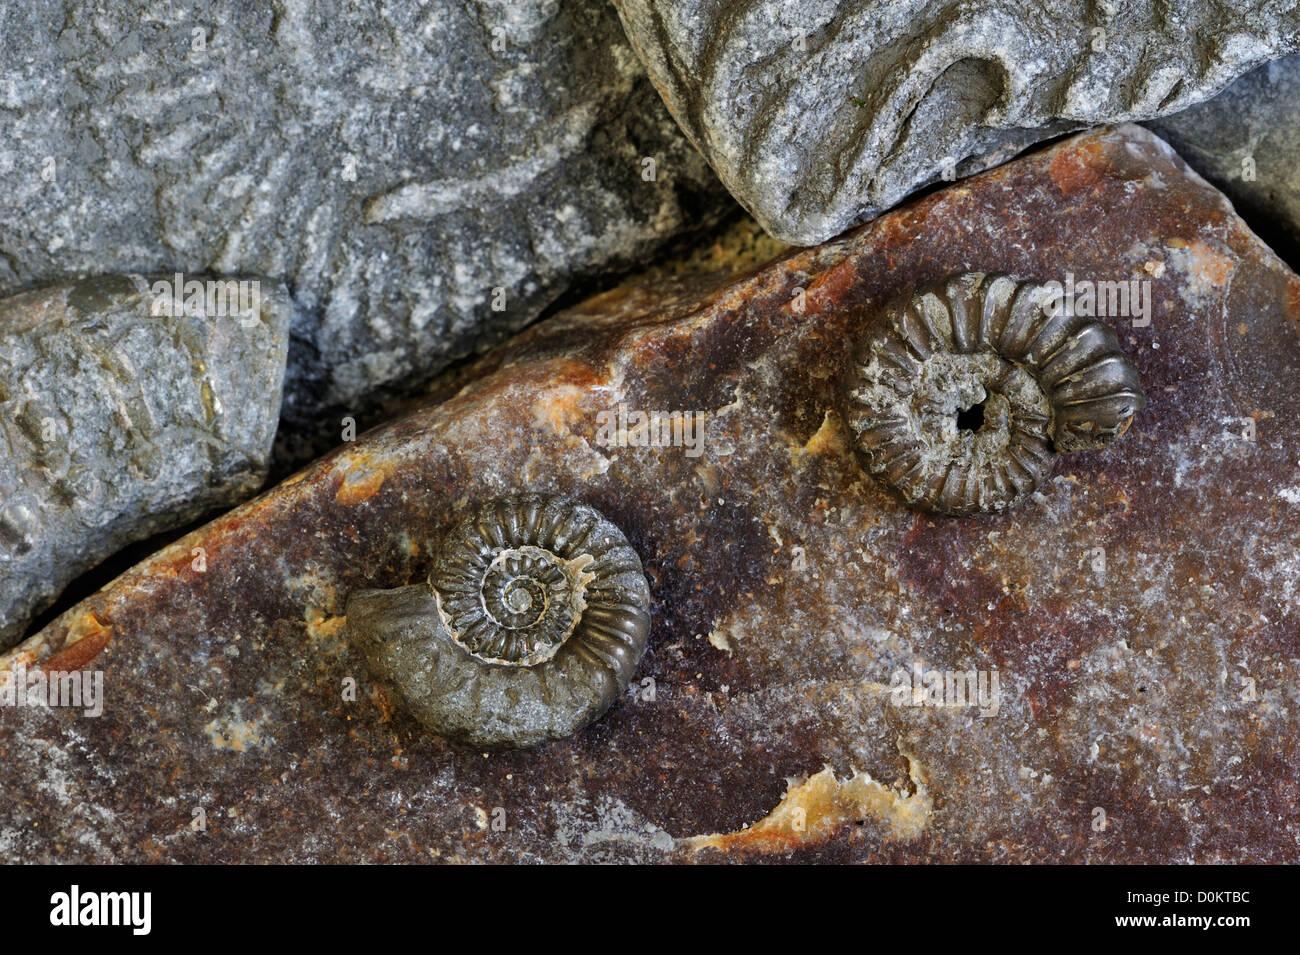 Ammonite fossils (Promicroceras planicosta) on shingle beach near Lyme Regis, Jurassic Coast, Dorset, southern England, UK Stock Photo